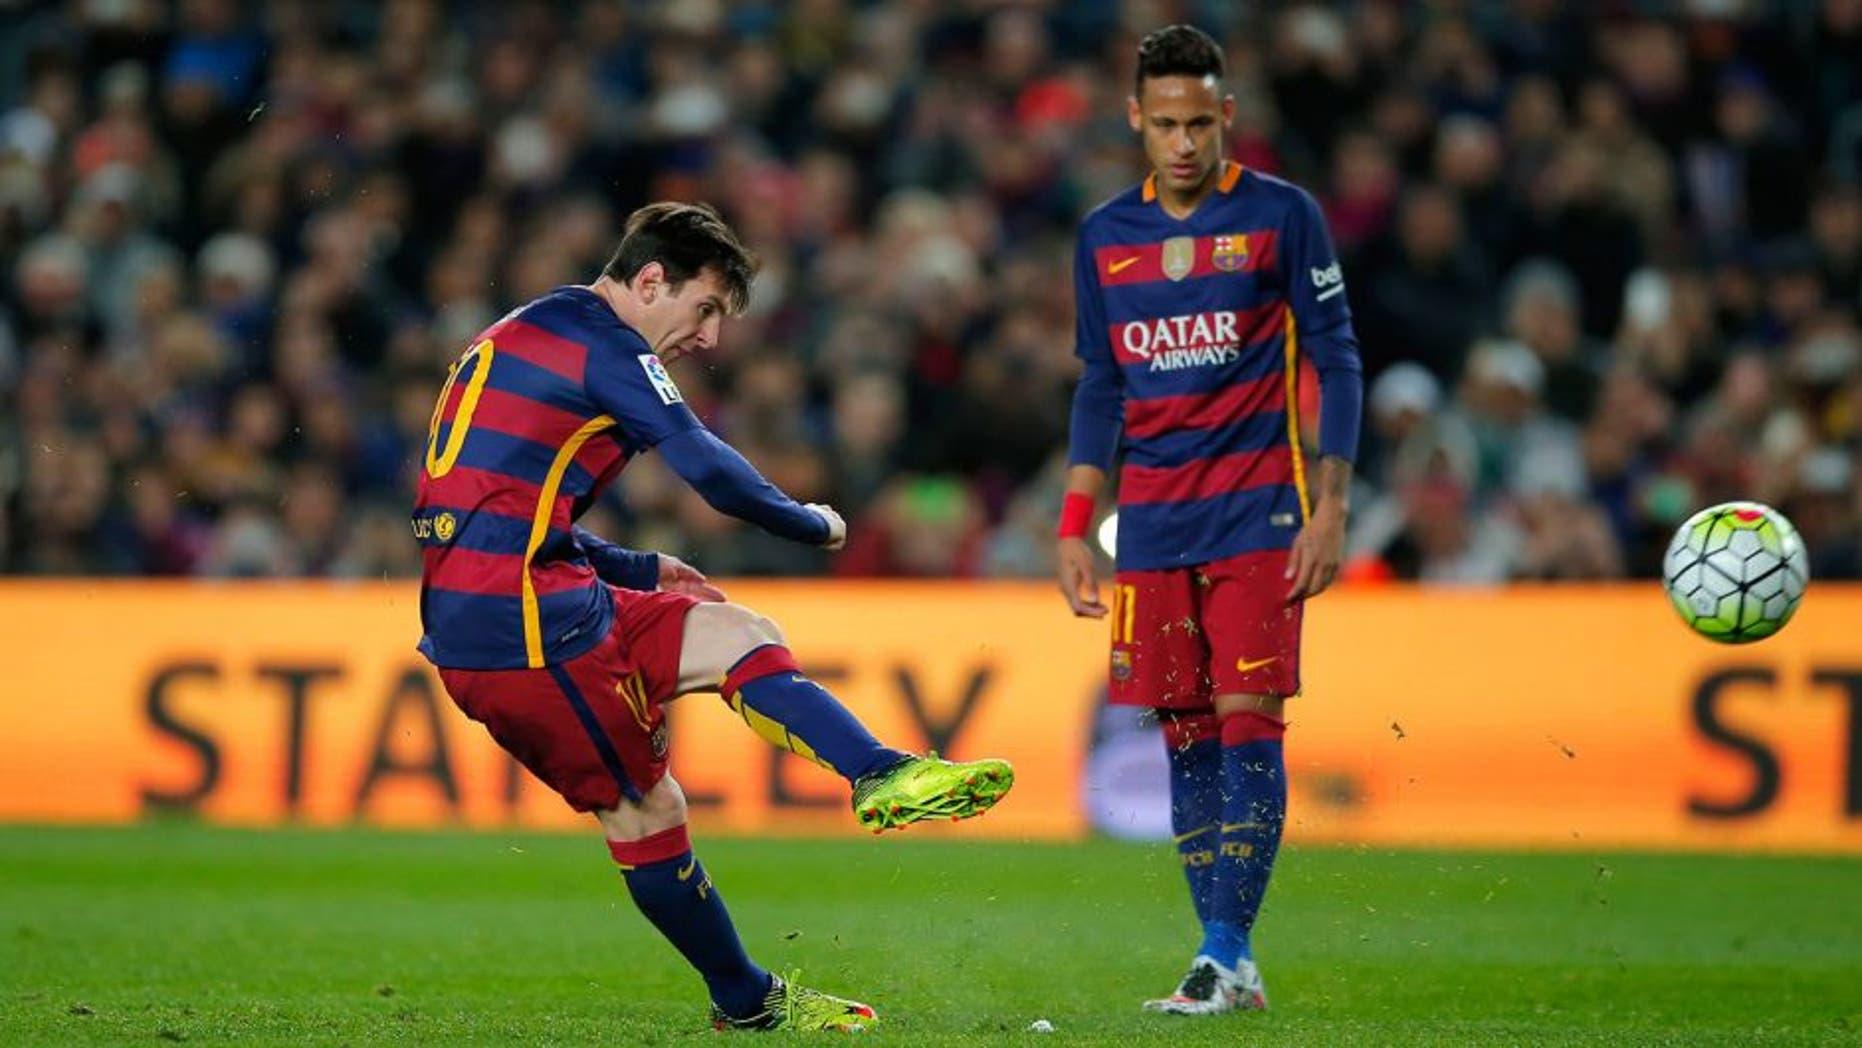 FC Barcelona's Lionel Messi, left, kicks the ball to score against Sevilla during a Spanish La Liga soccer match at the Camp Nou stadium in Barcelona, Spain, Sunday, Feb. 28, 2016. (AP Photo/Manu Fernandez)